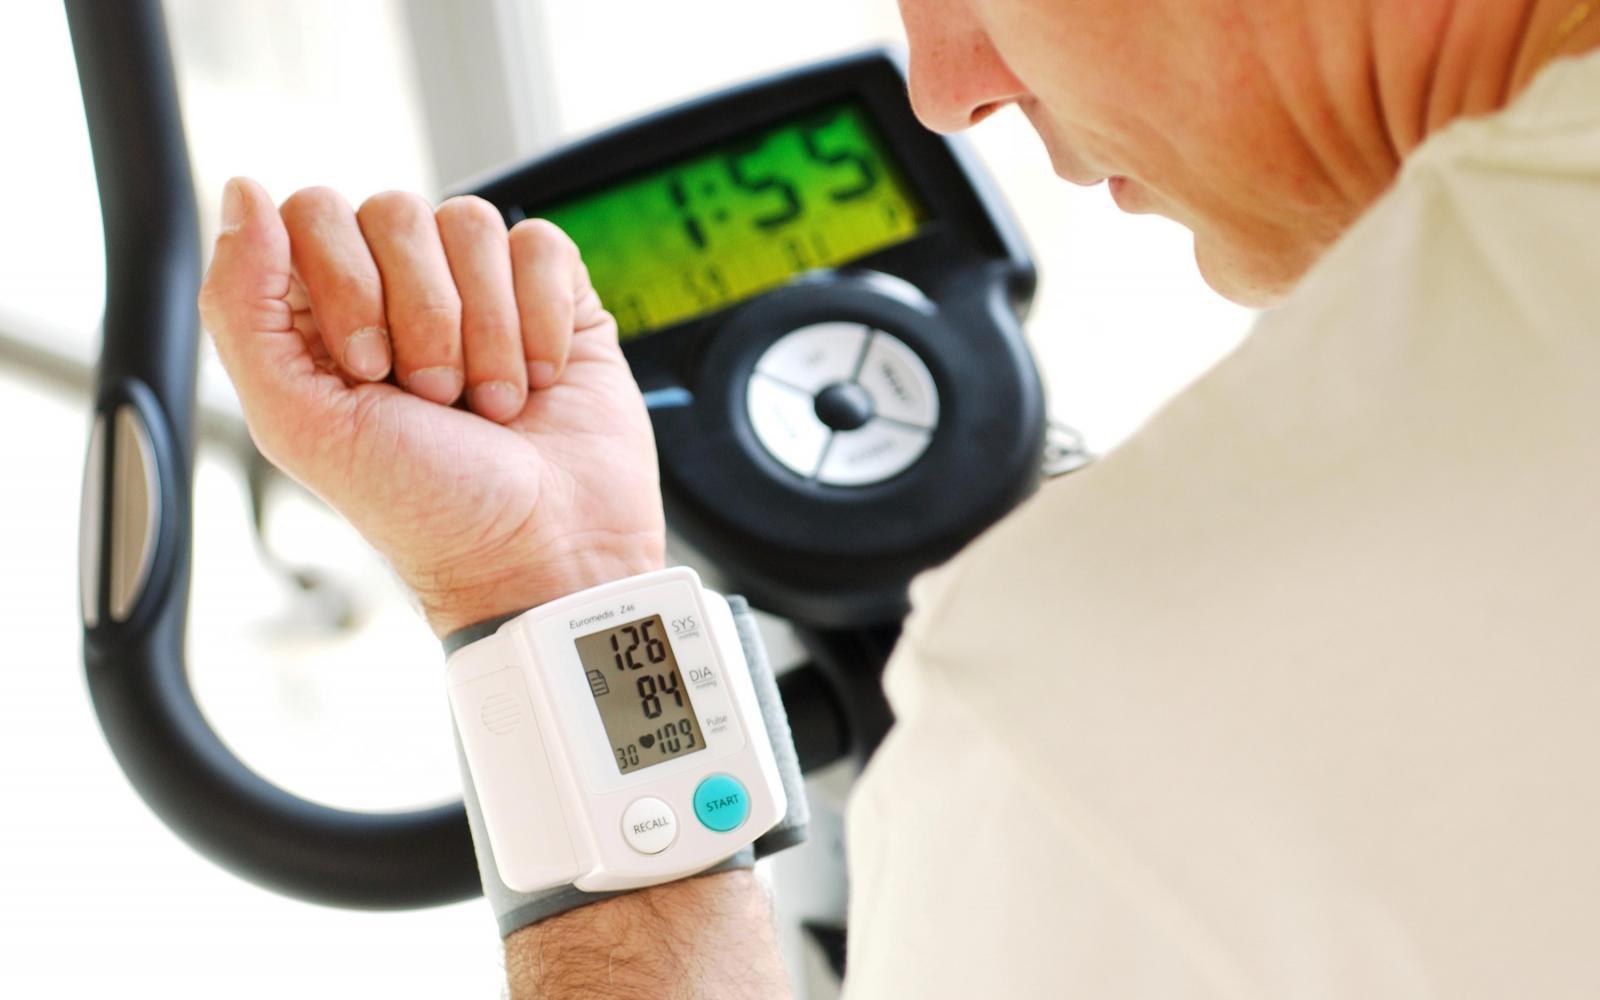 torvacard hipertónia magas vérnyomás idős embernél